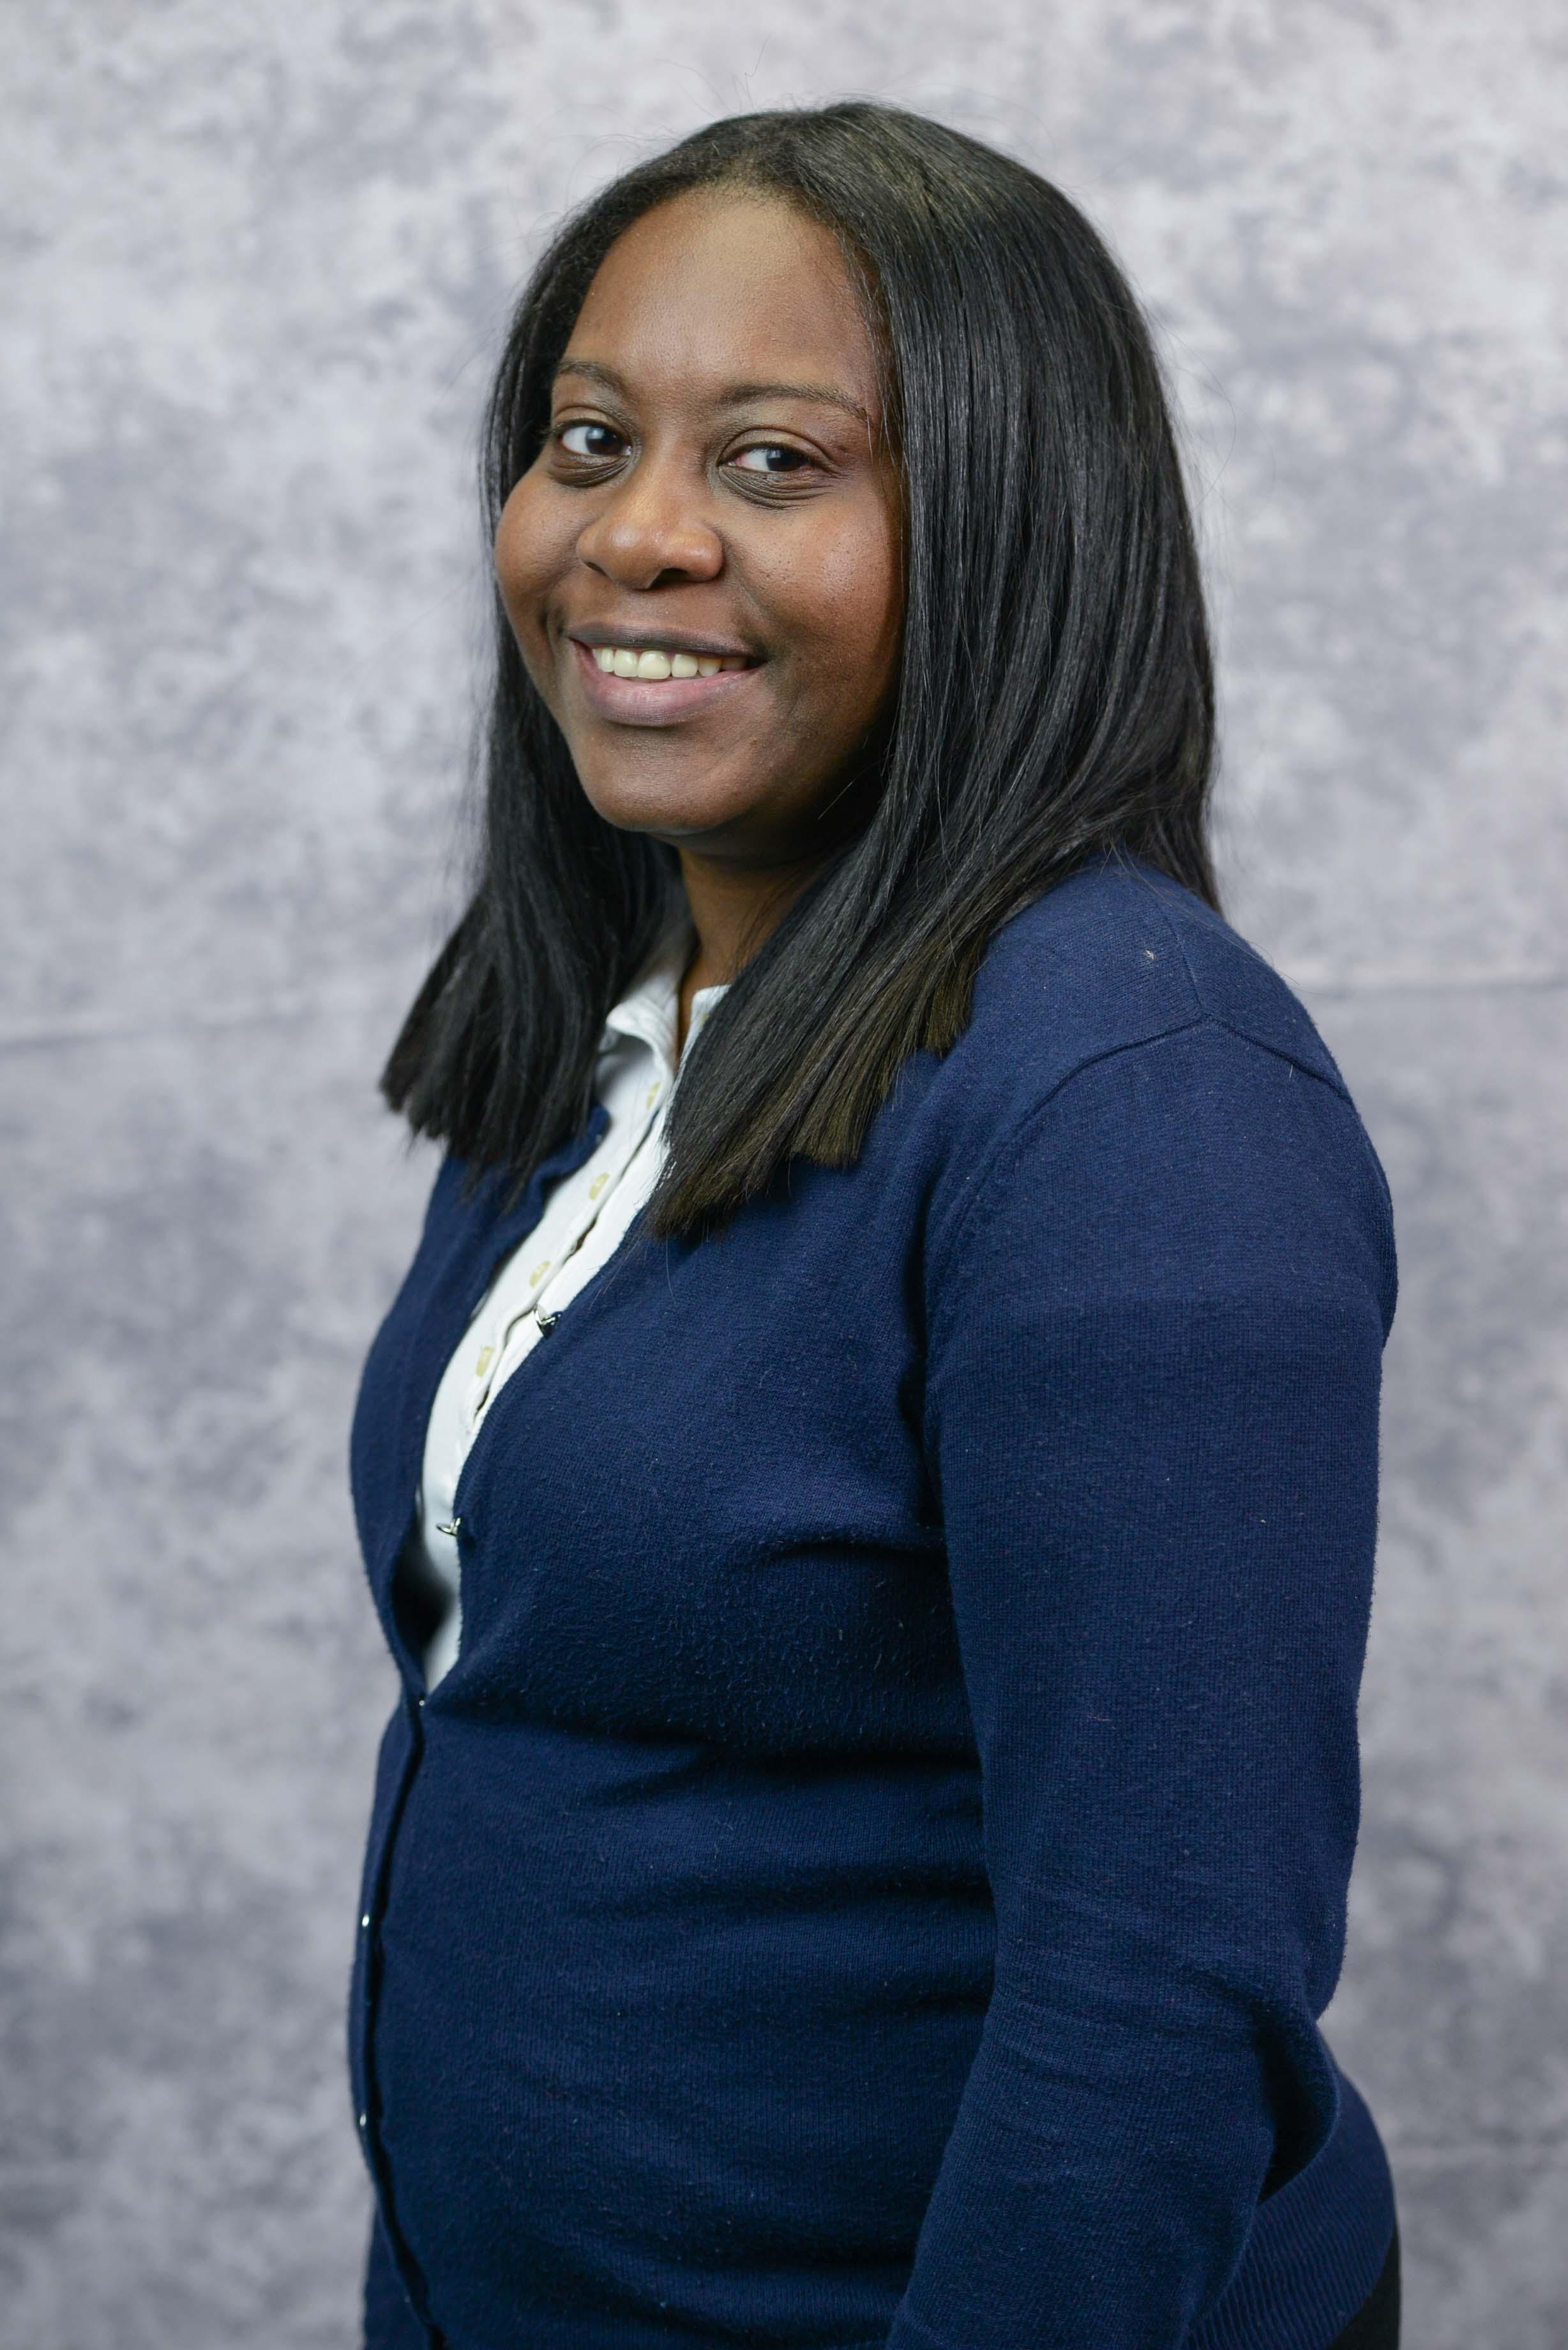 Stephanie Hayward, Asst. Drill Coord. BkN